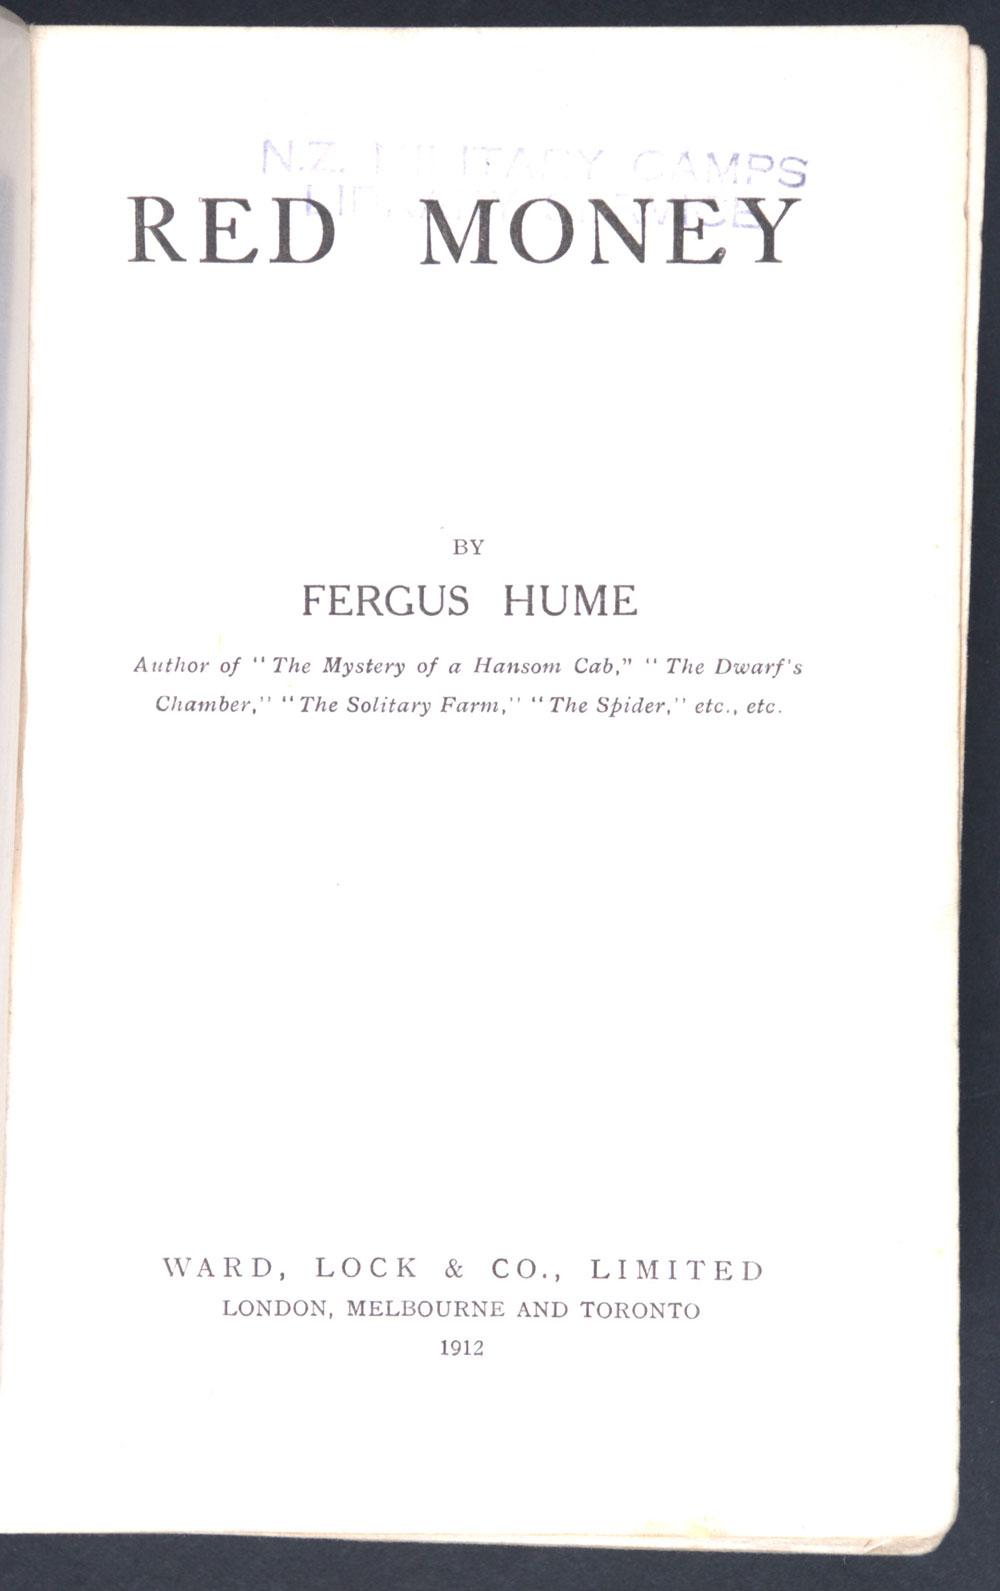 Fergus Hume. <em>Red money</em>. London: Ward, Lock, 1912.